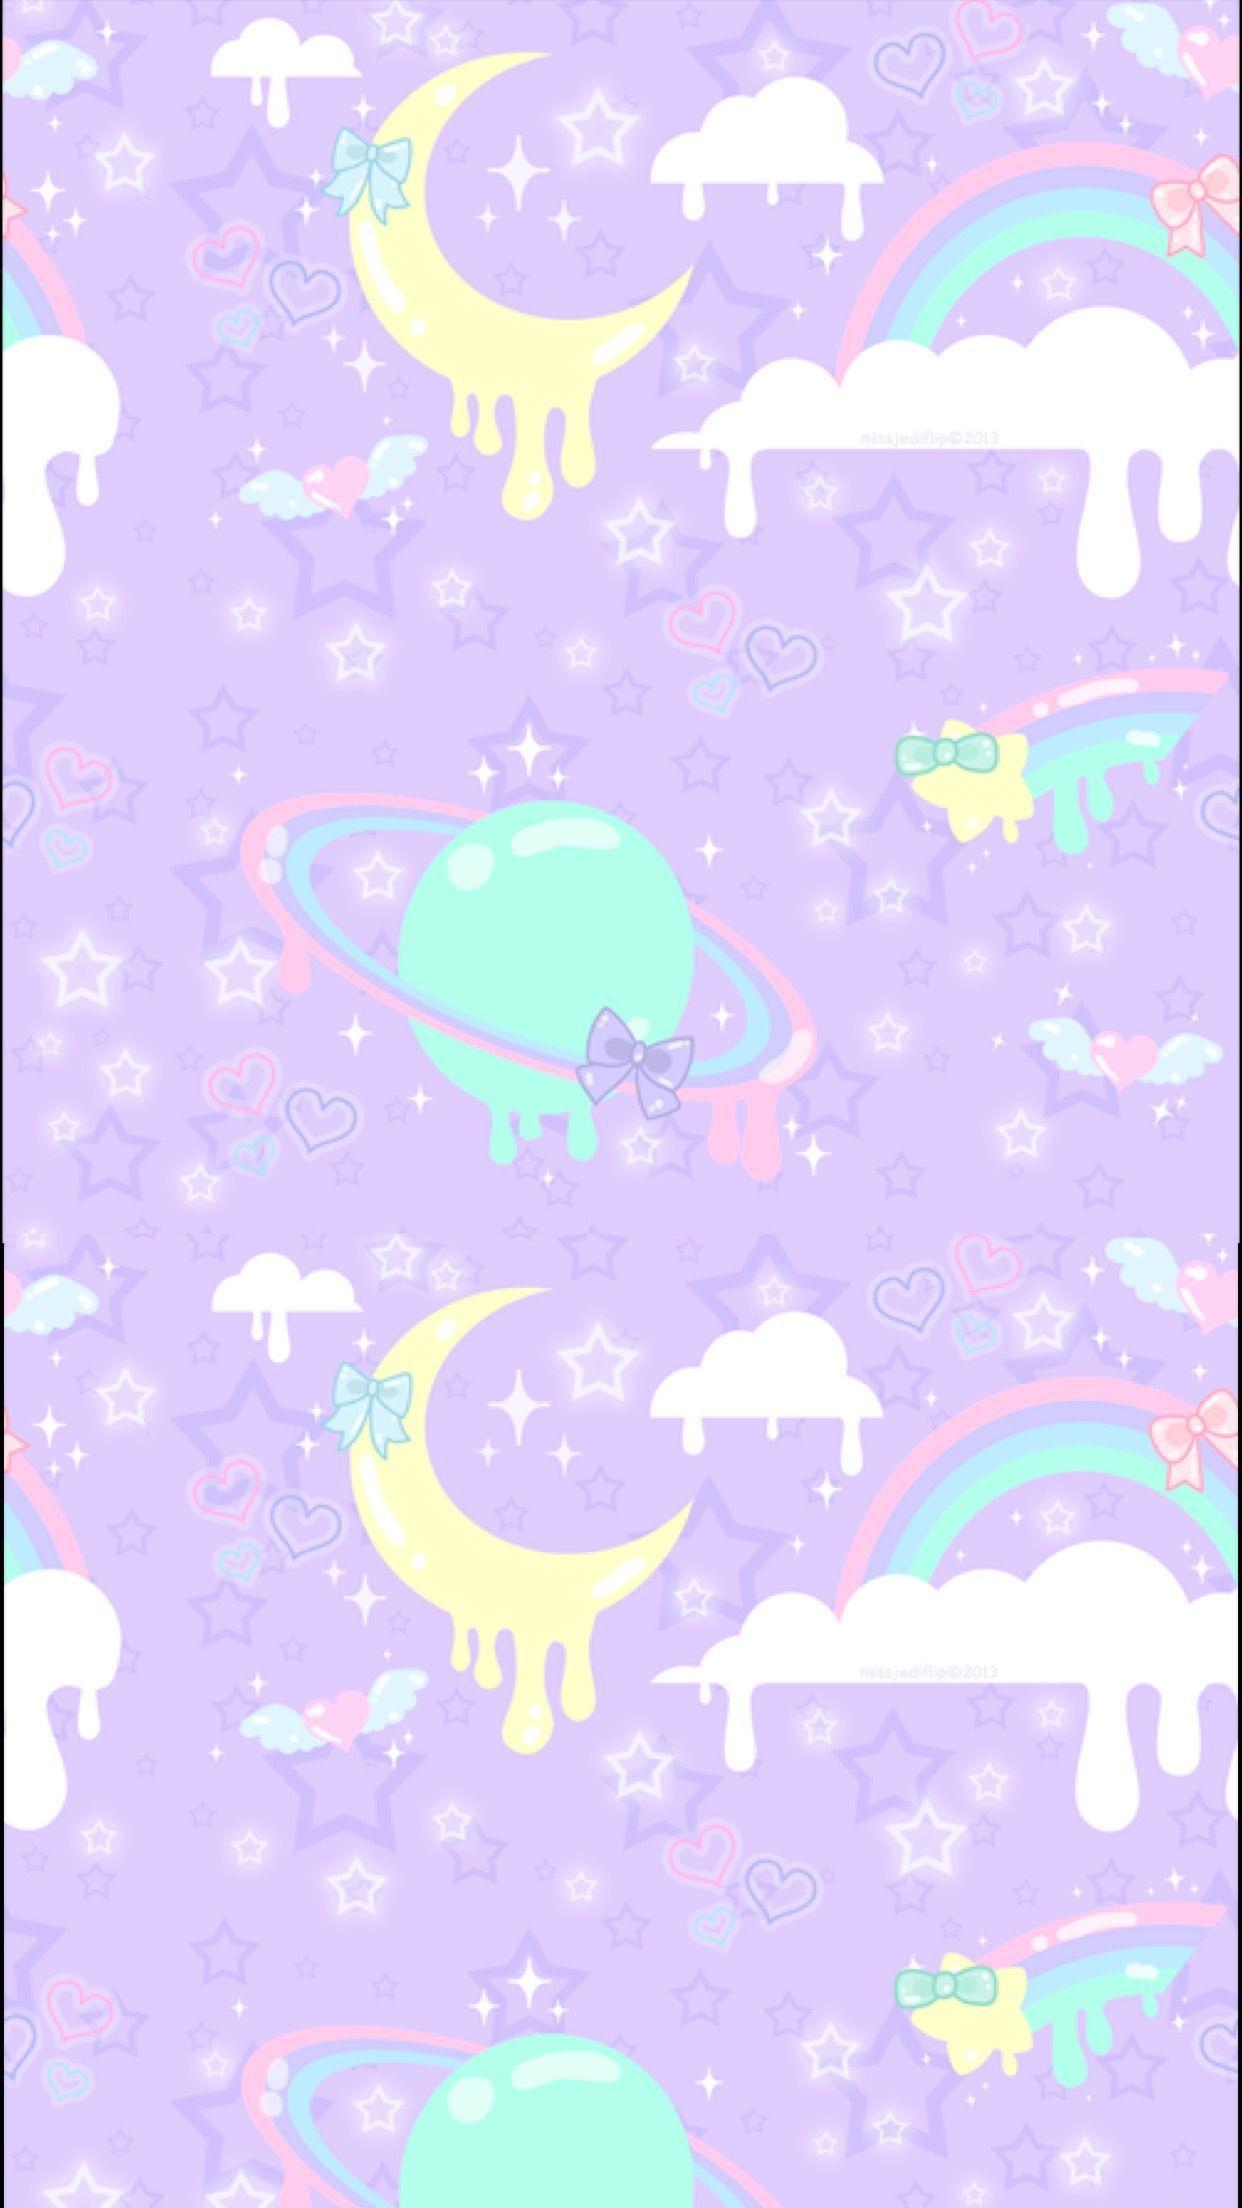 Pastel Goth Wallpapers Wallpaper Cave Milye Risunki Illyustracii Risunki